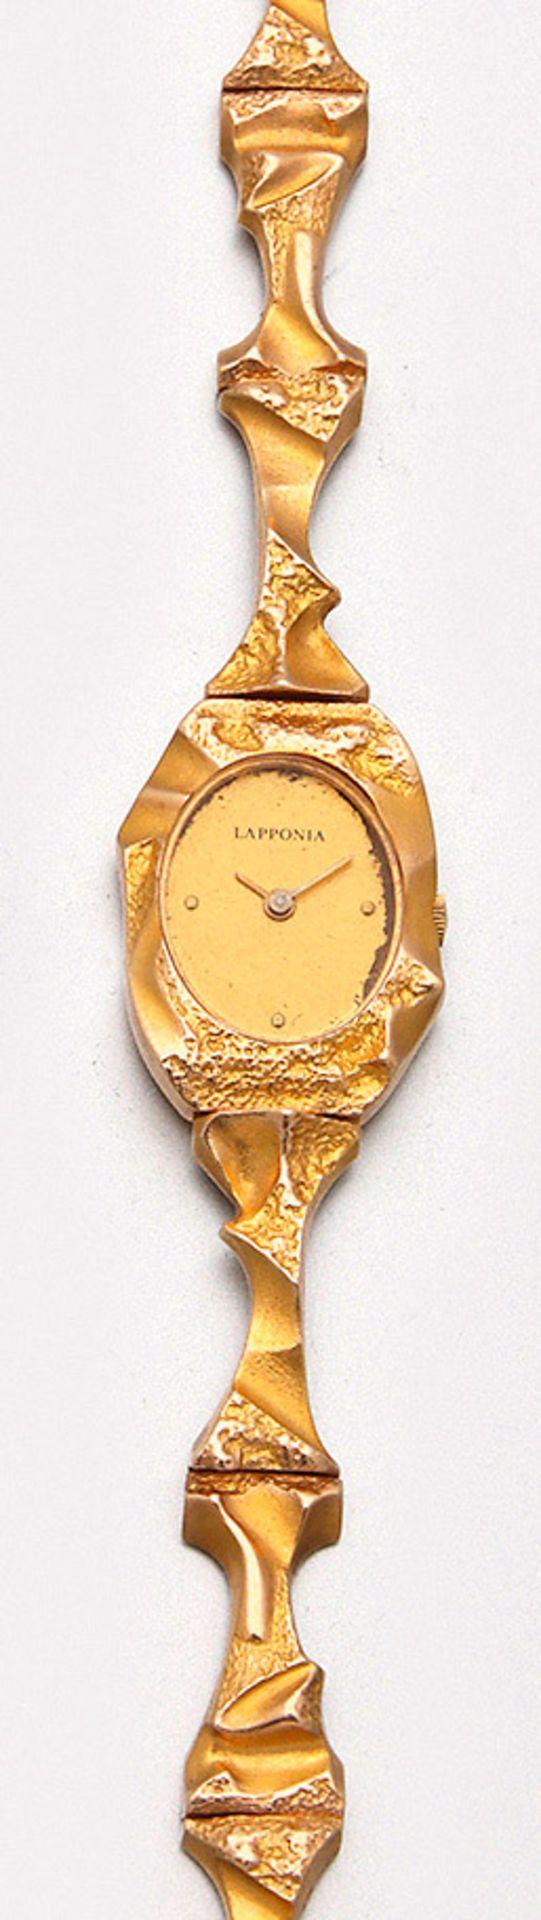 "Lapponia-Damenarmbanduhr ""Pola Negri"""